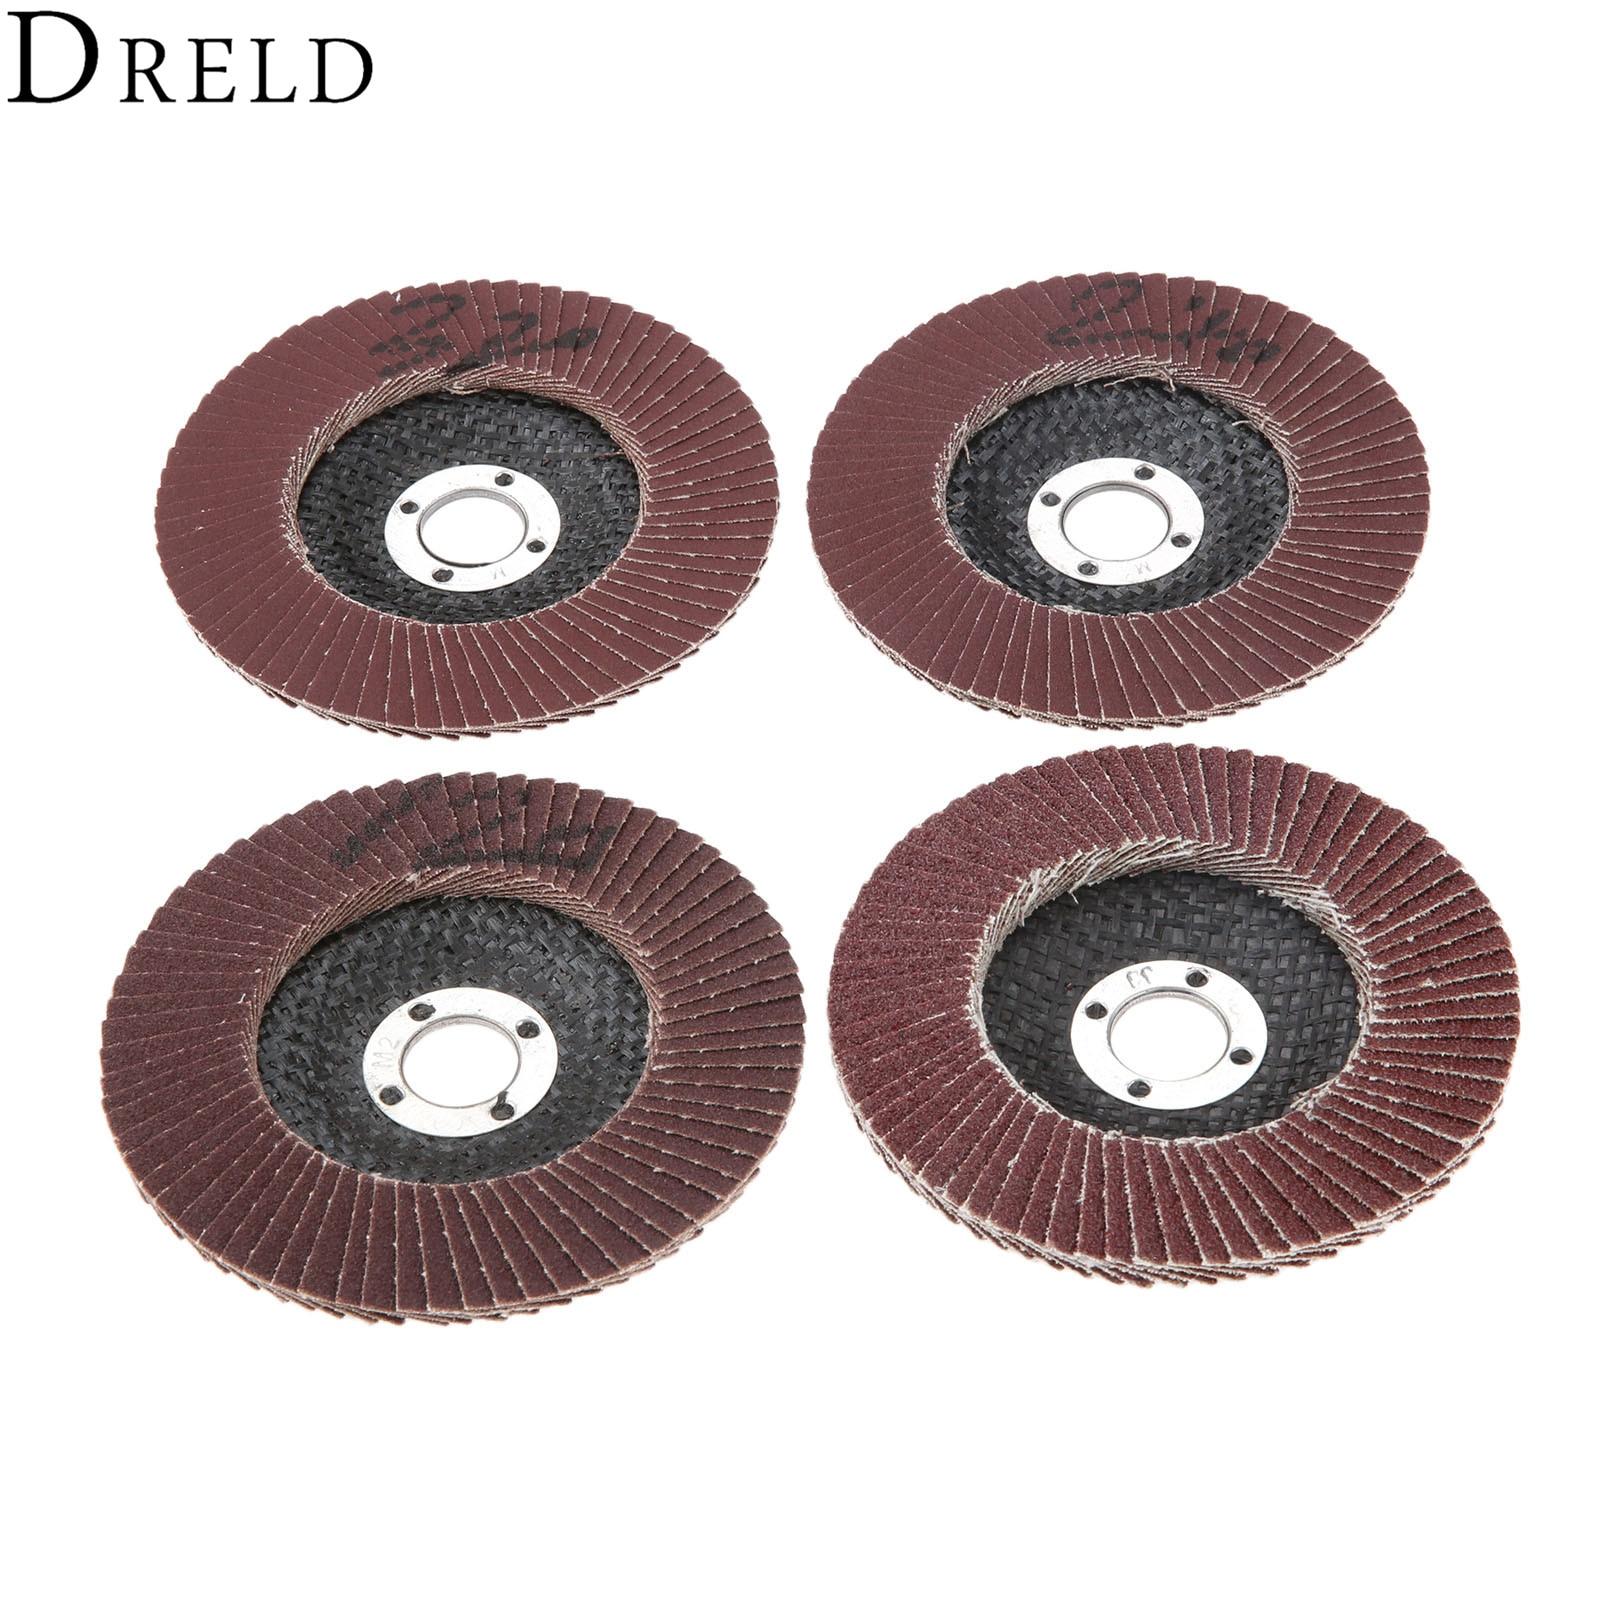 DRELD 1Pc Dremel Accessories Grinding Wheels Flap Discs 100mm Angle Grinder Sanding Discs Abrasive Tool  80/120/240/320 Grit